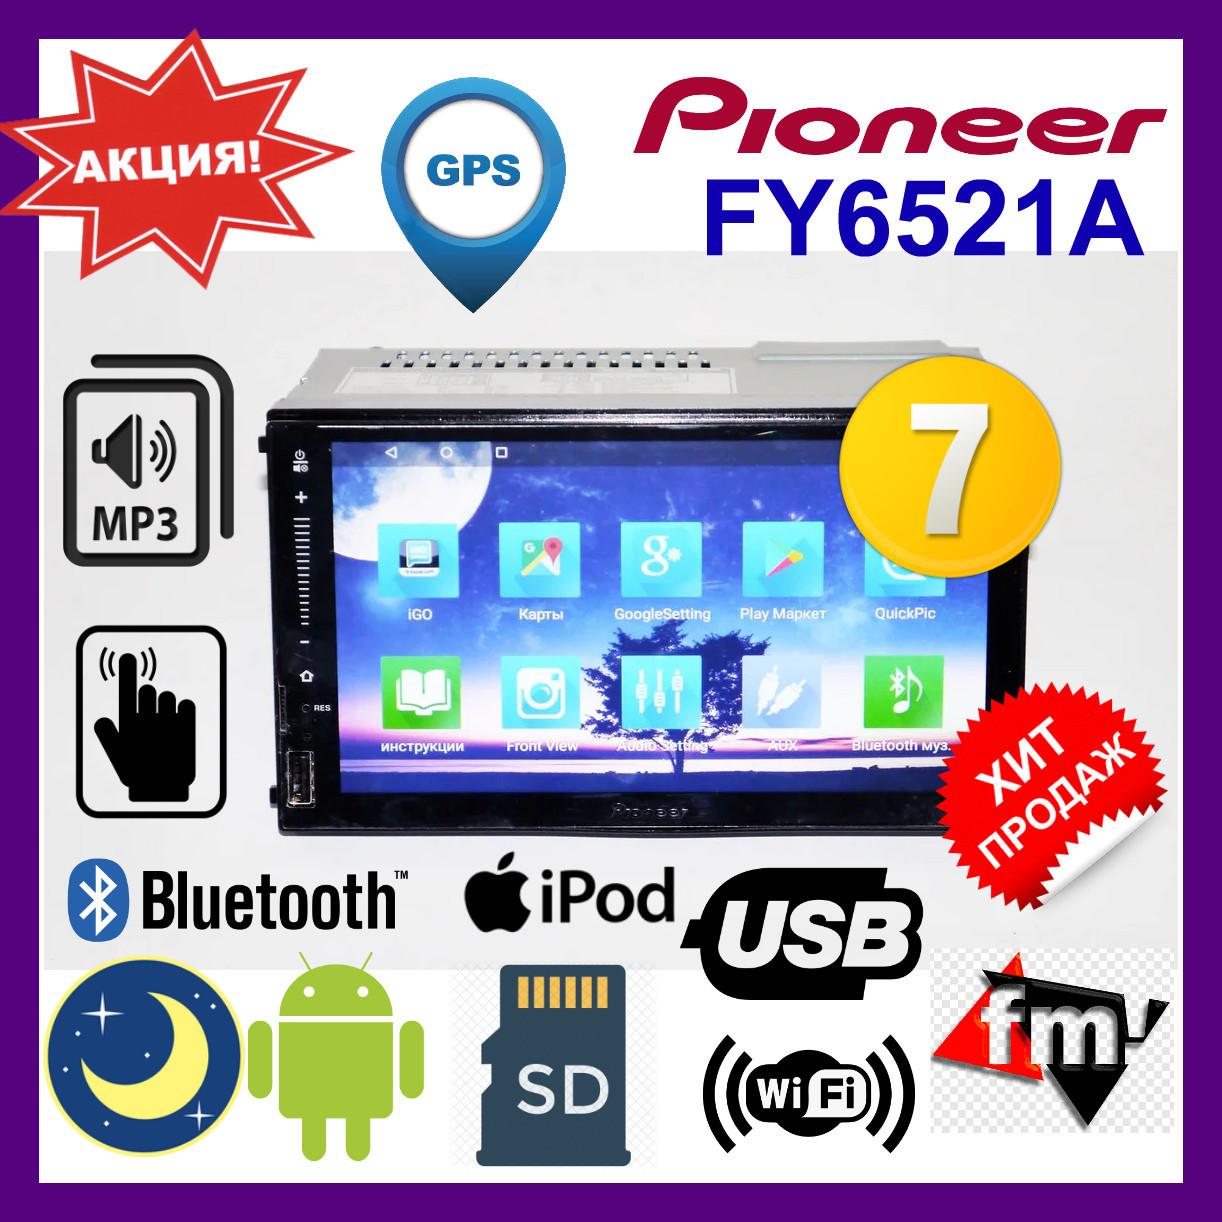 "Автомагнітола 2DIN Pioneer FY6521A Android 7.1.1 GPS Wi-fi з пультом на кермо. BT 7"". Магнітоли піонер"